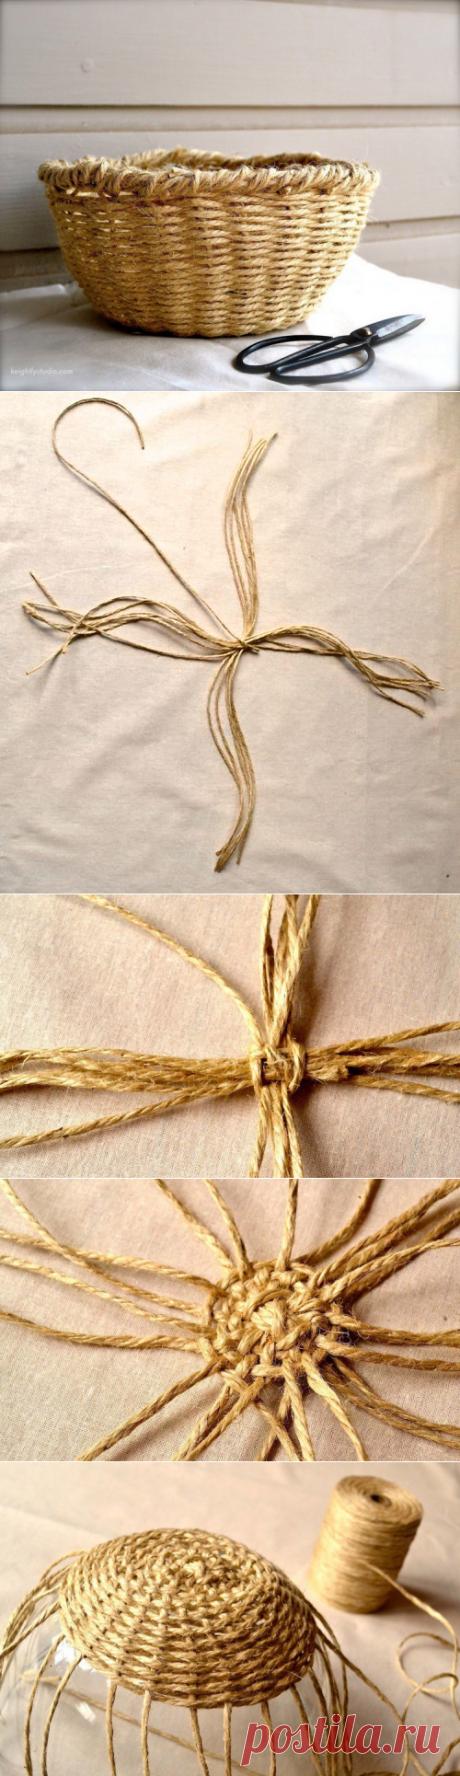 Плетём корзинку